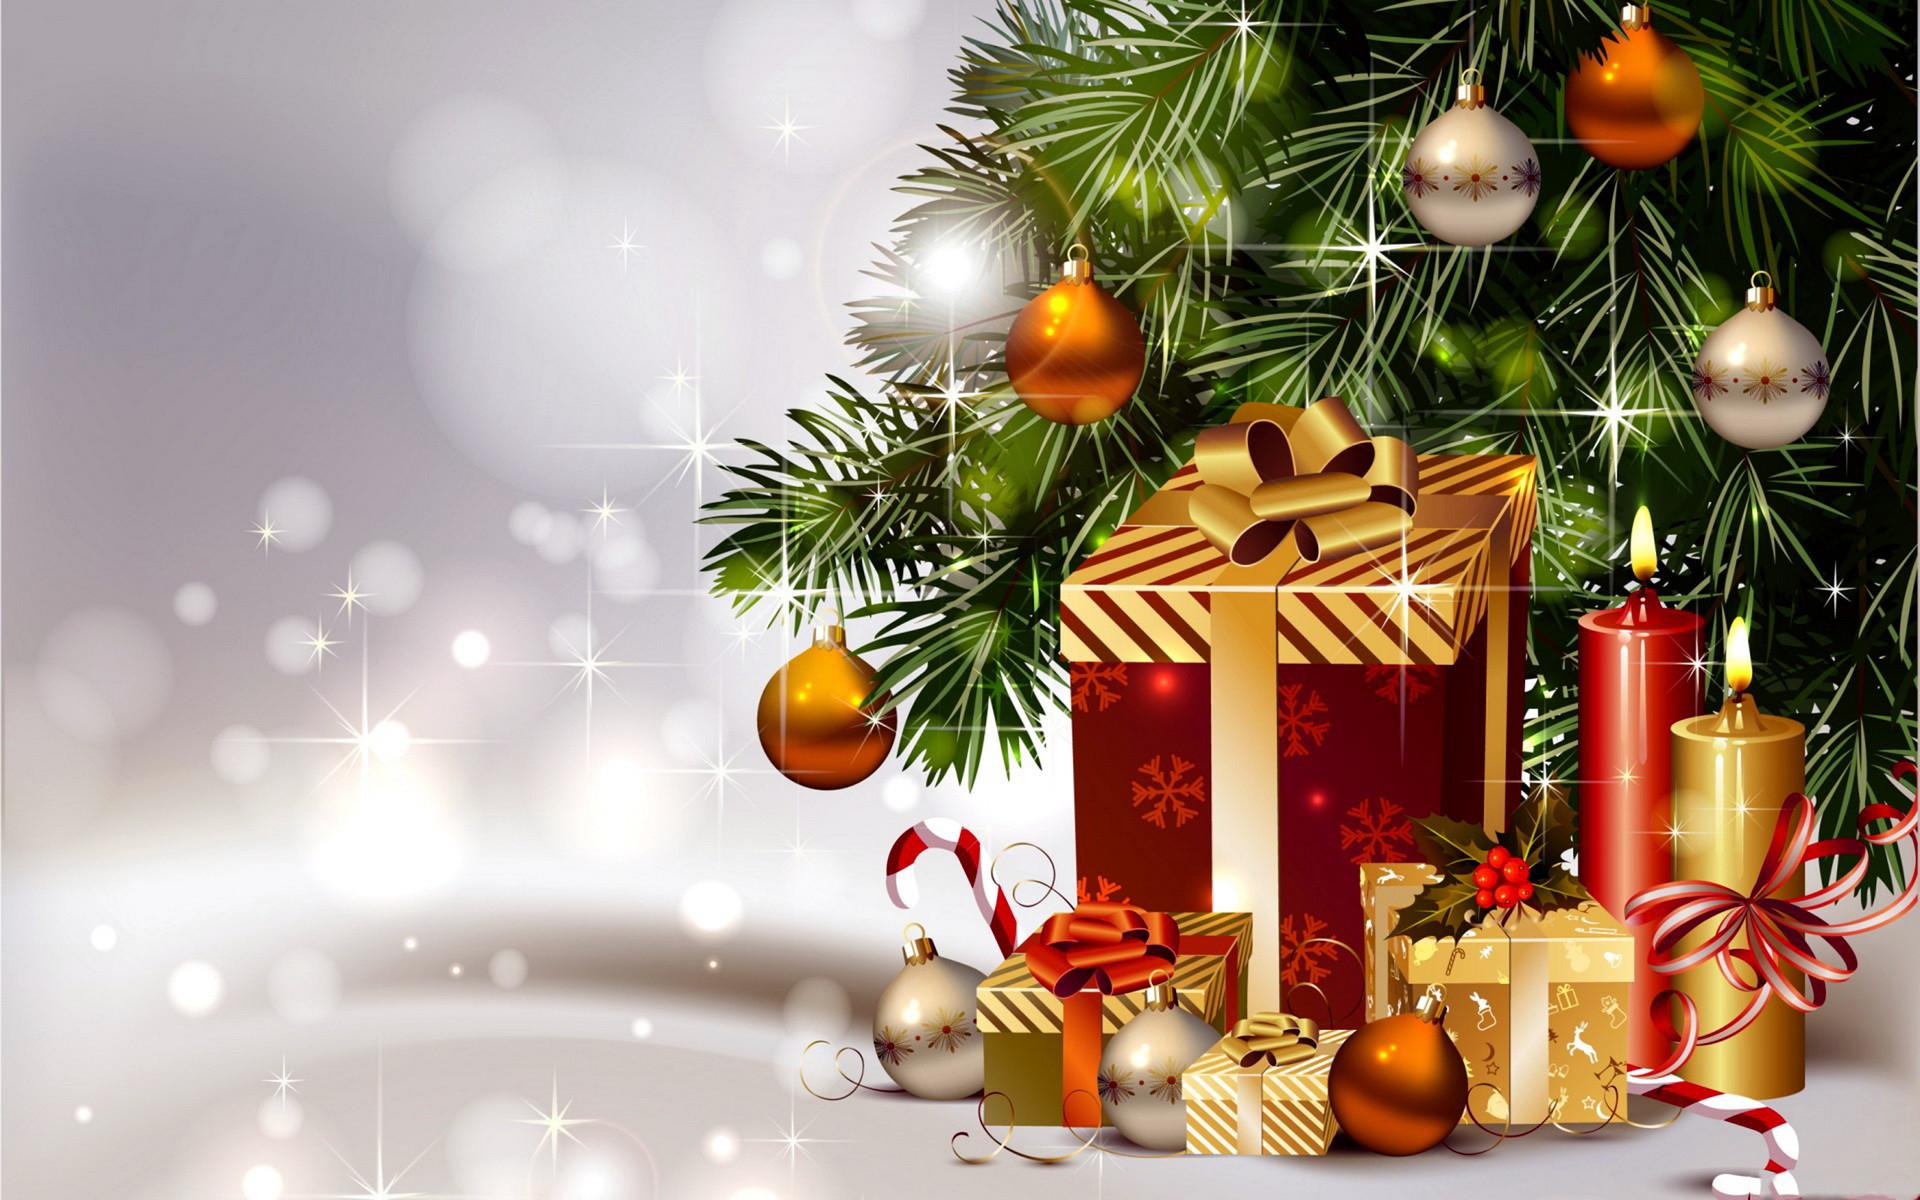 Merry Christmas Backgrounds Desktop ·①